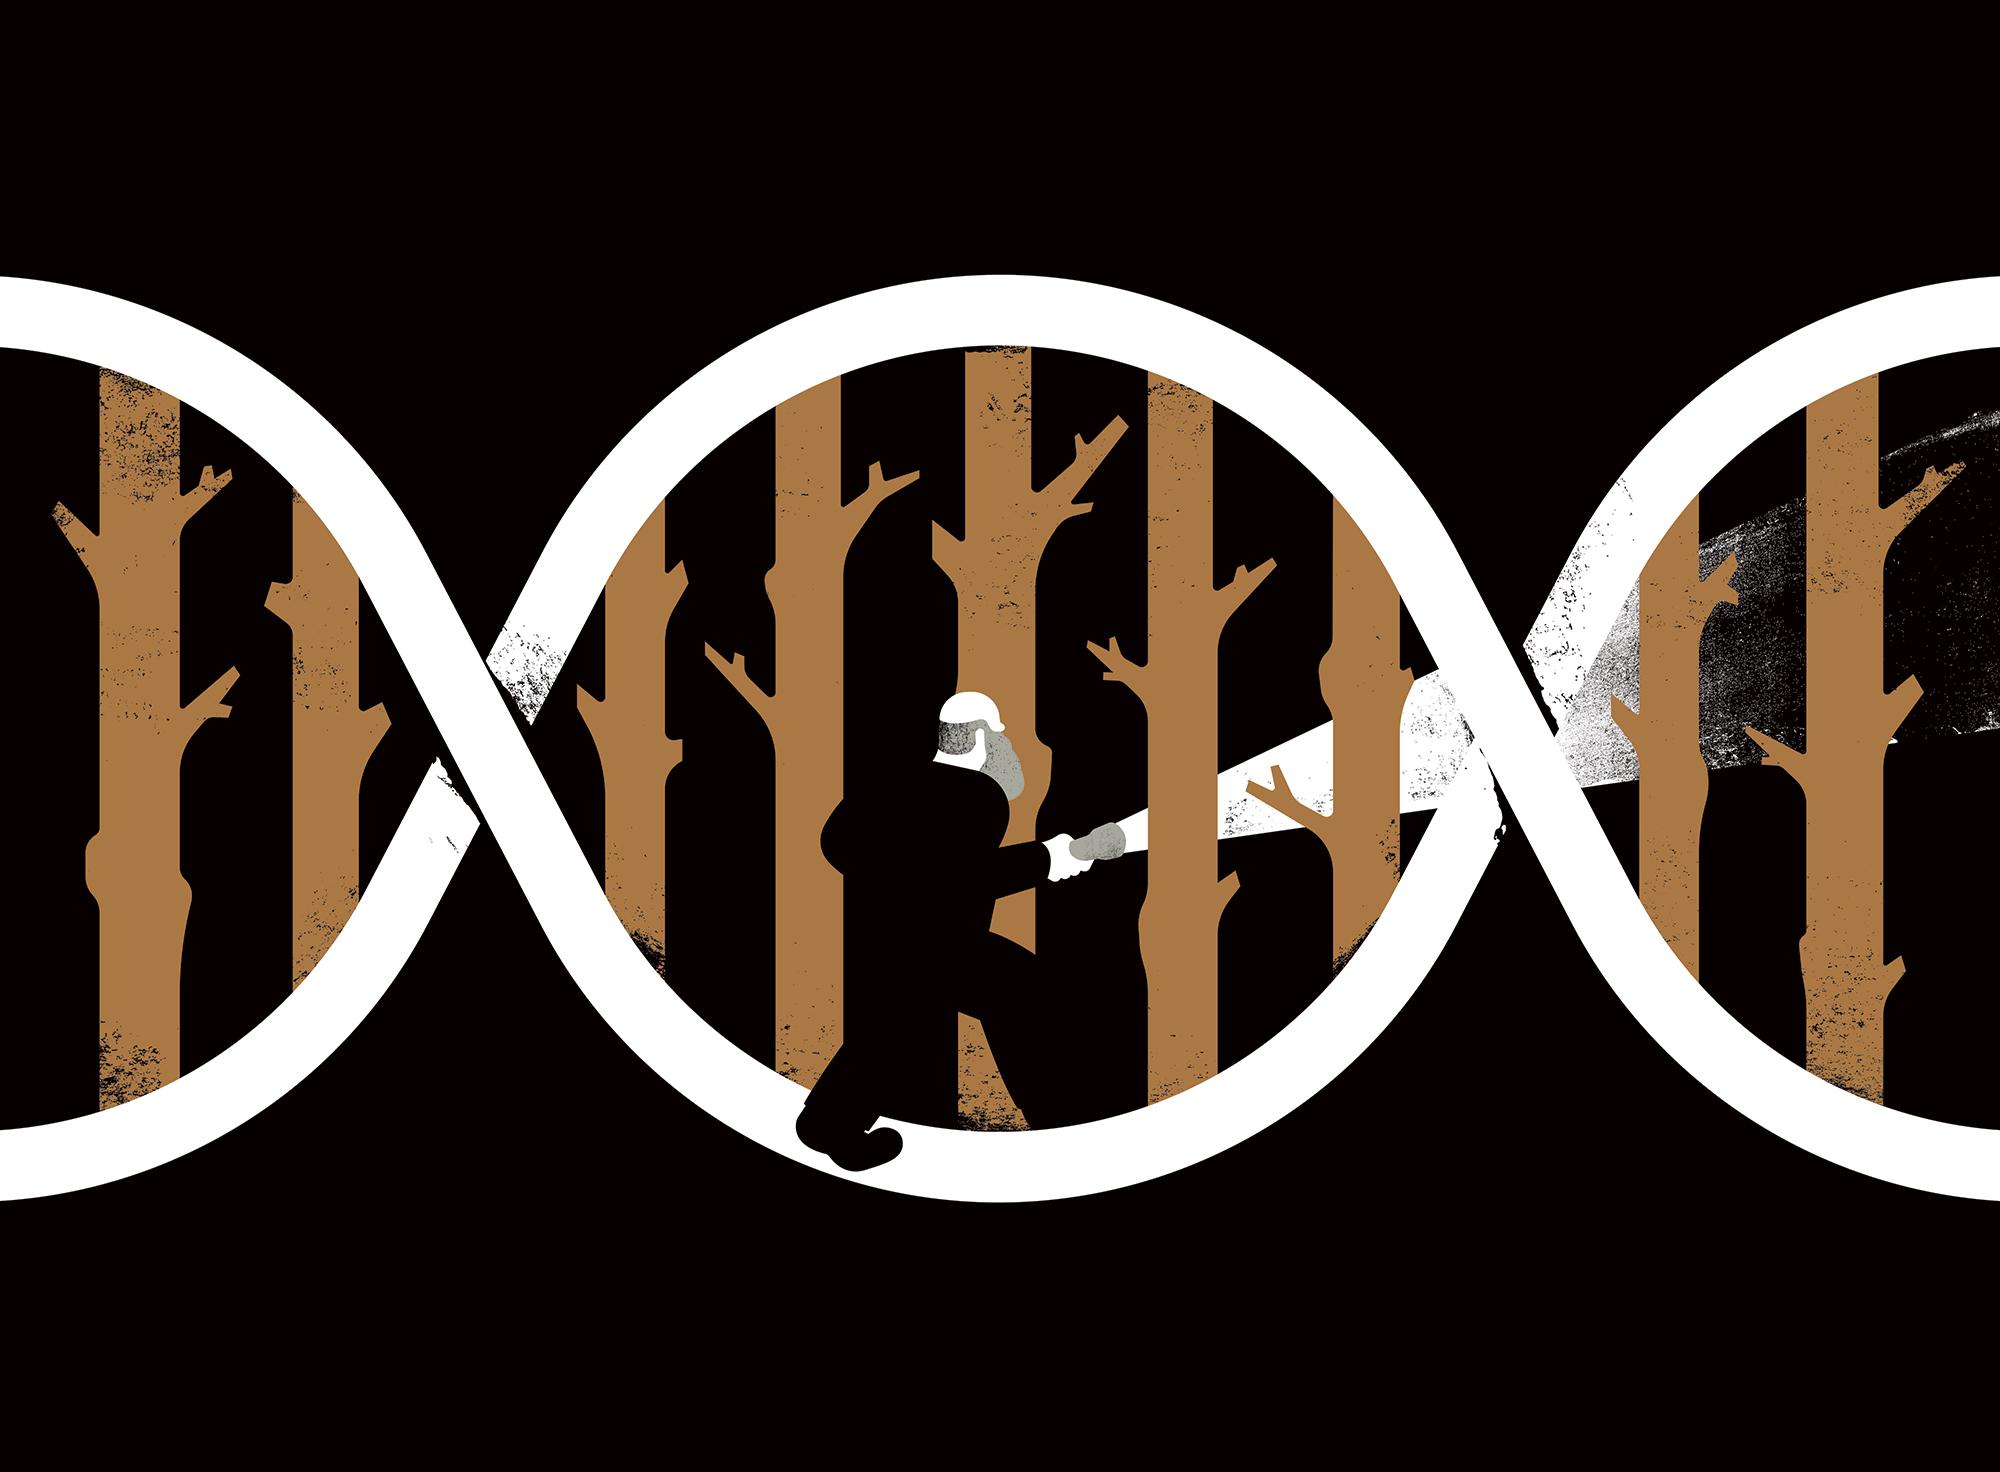 Dark DNA – The Hidden Genes That Drive Evolution (Cover Illustration)